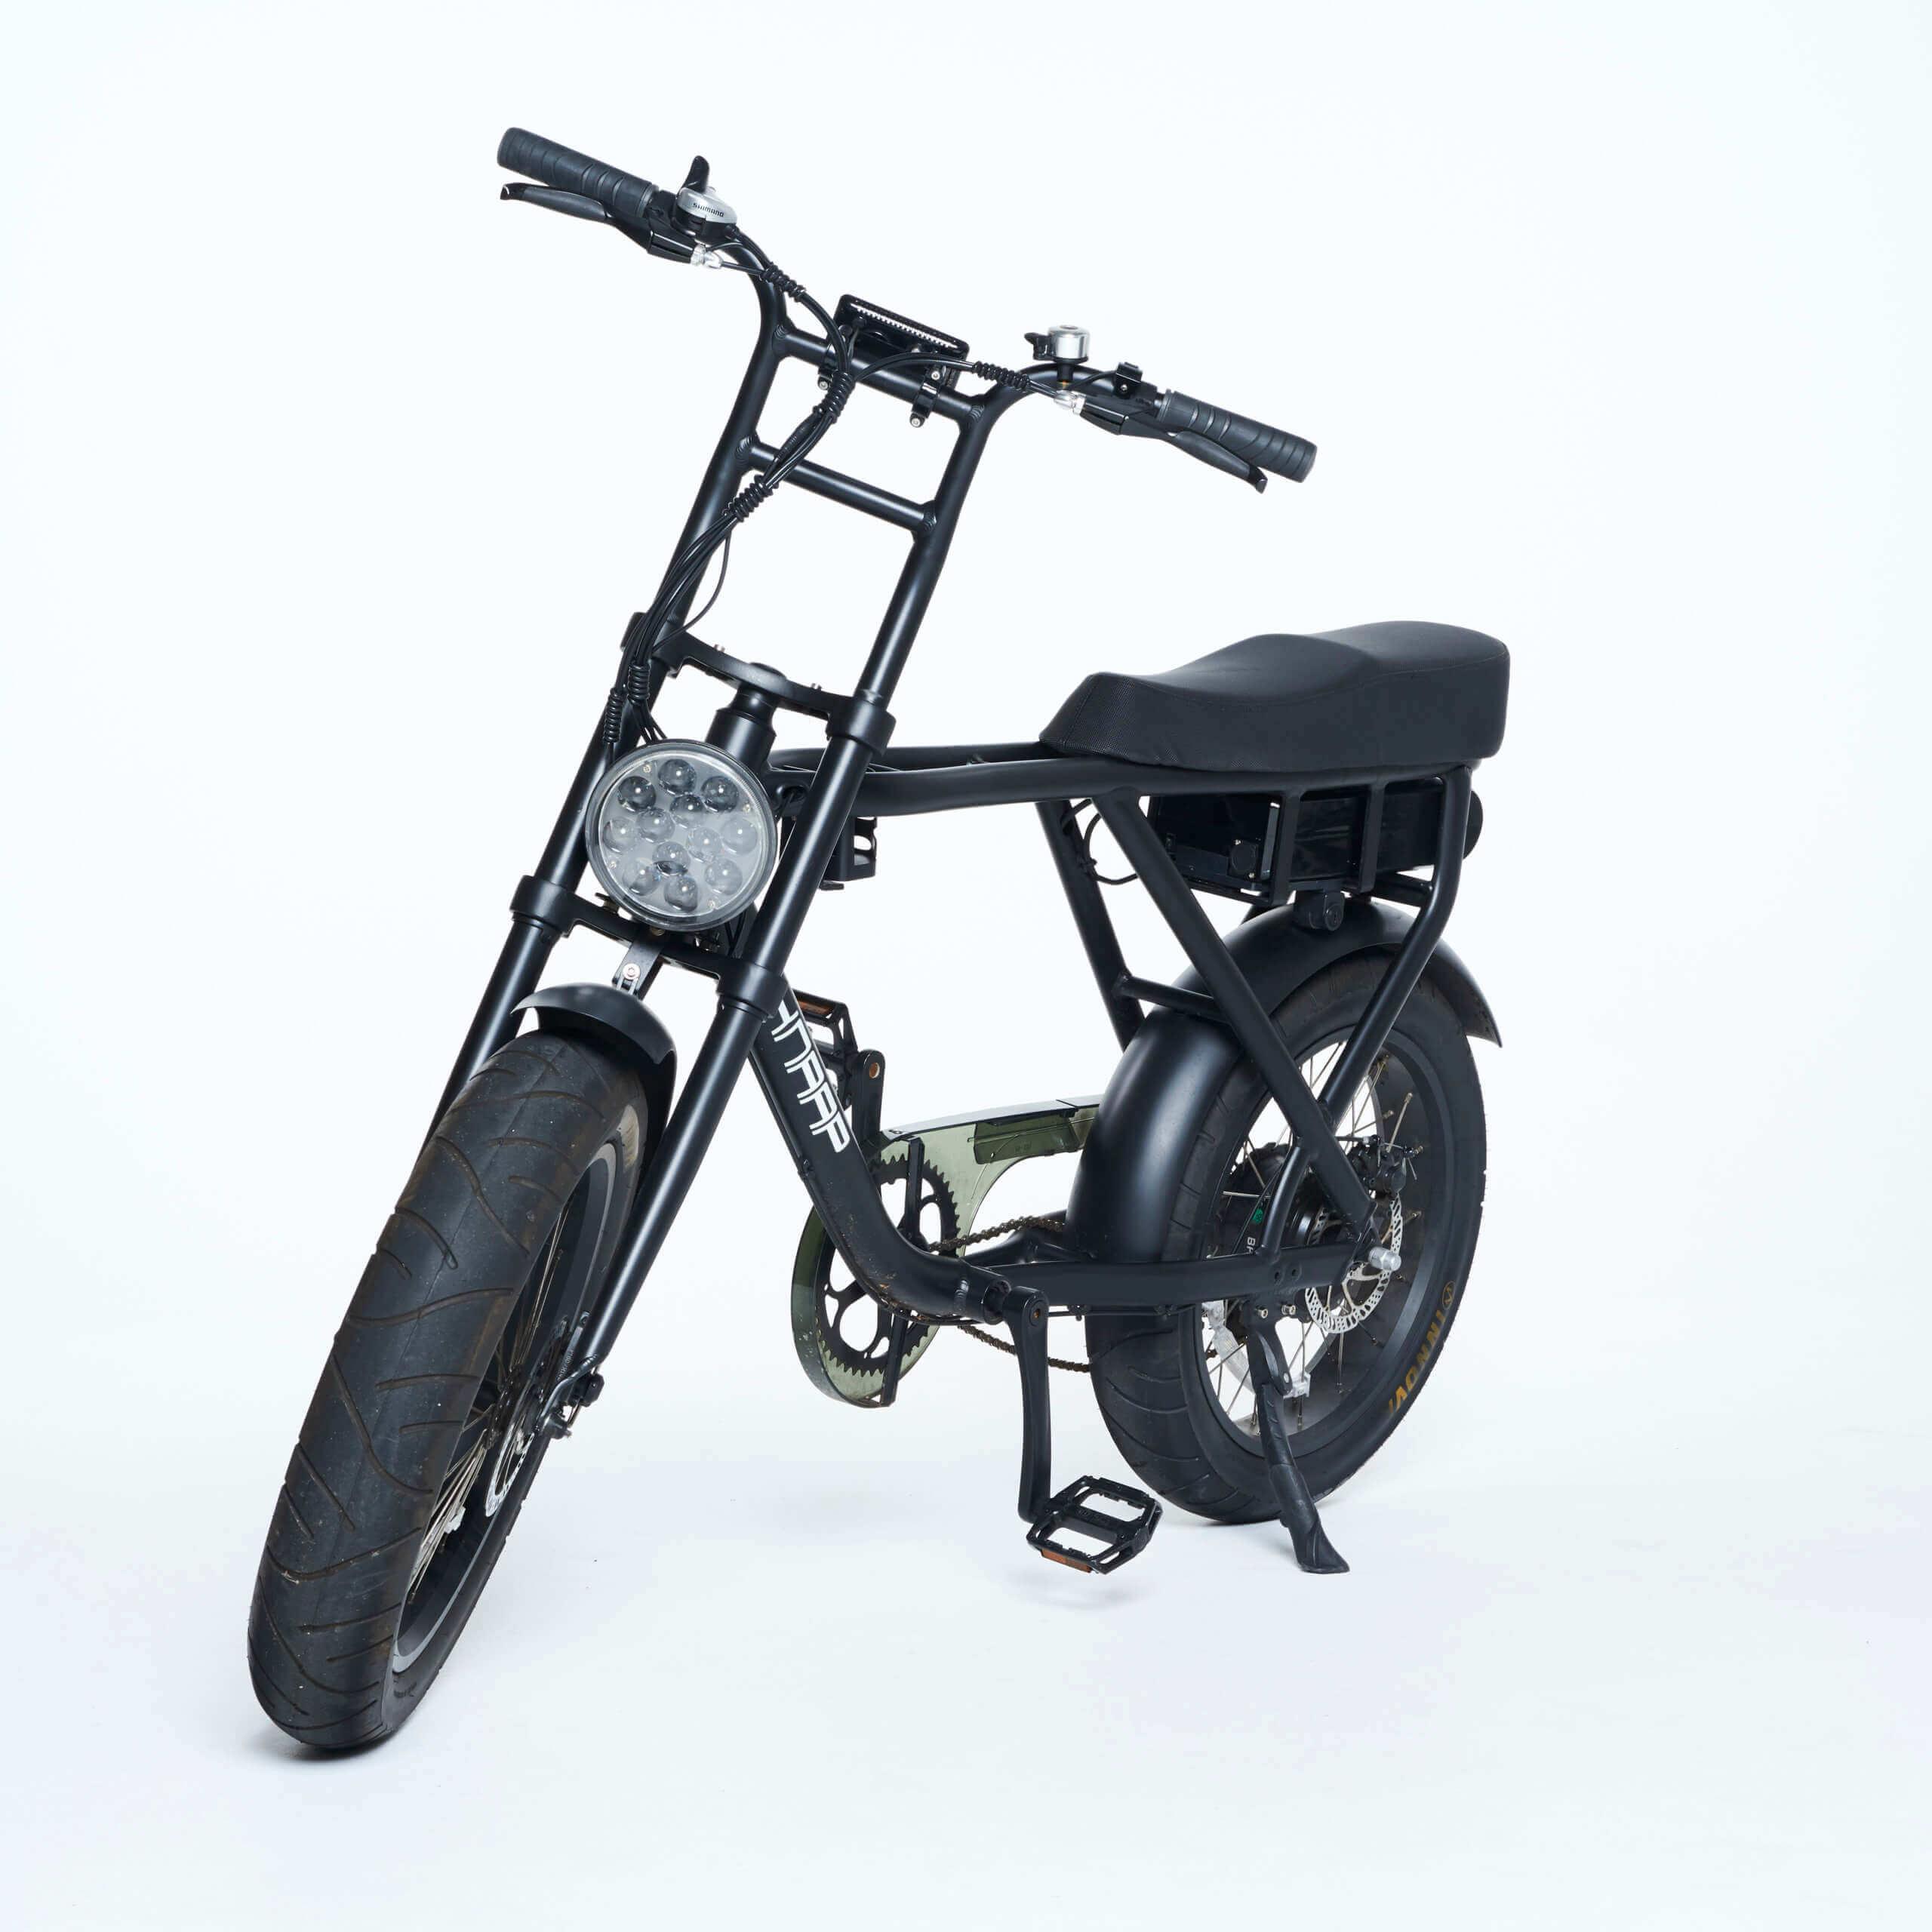 Knaap Bikes